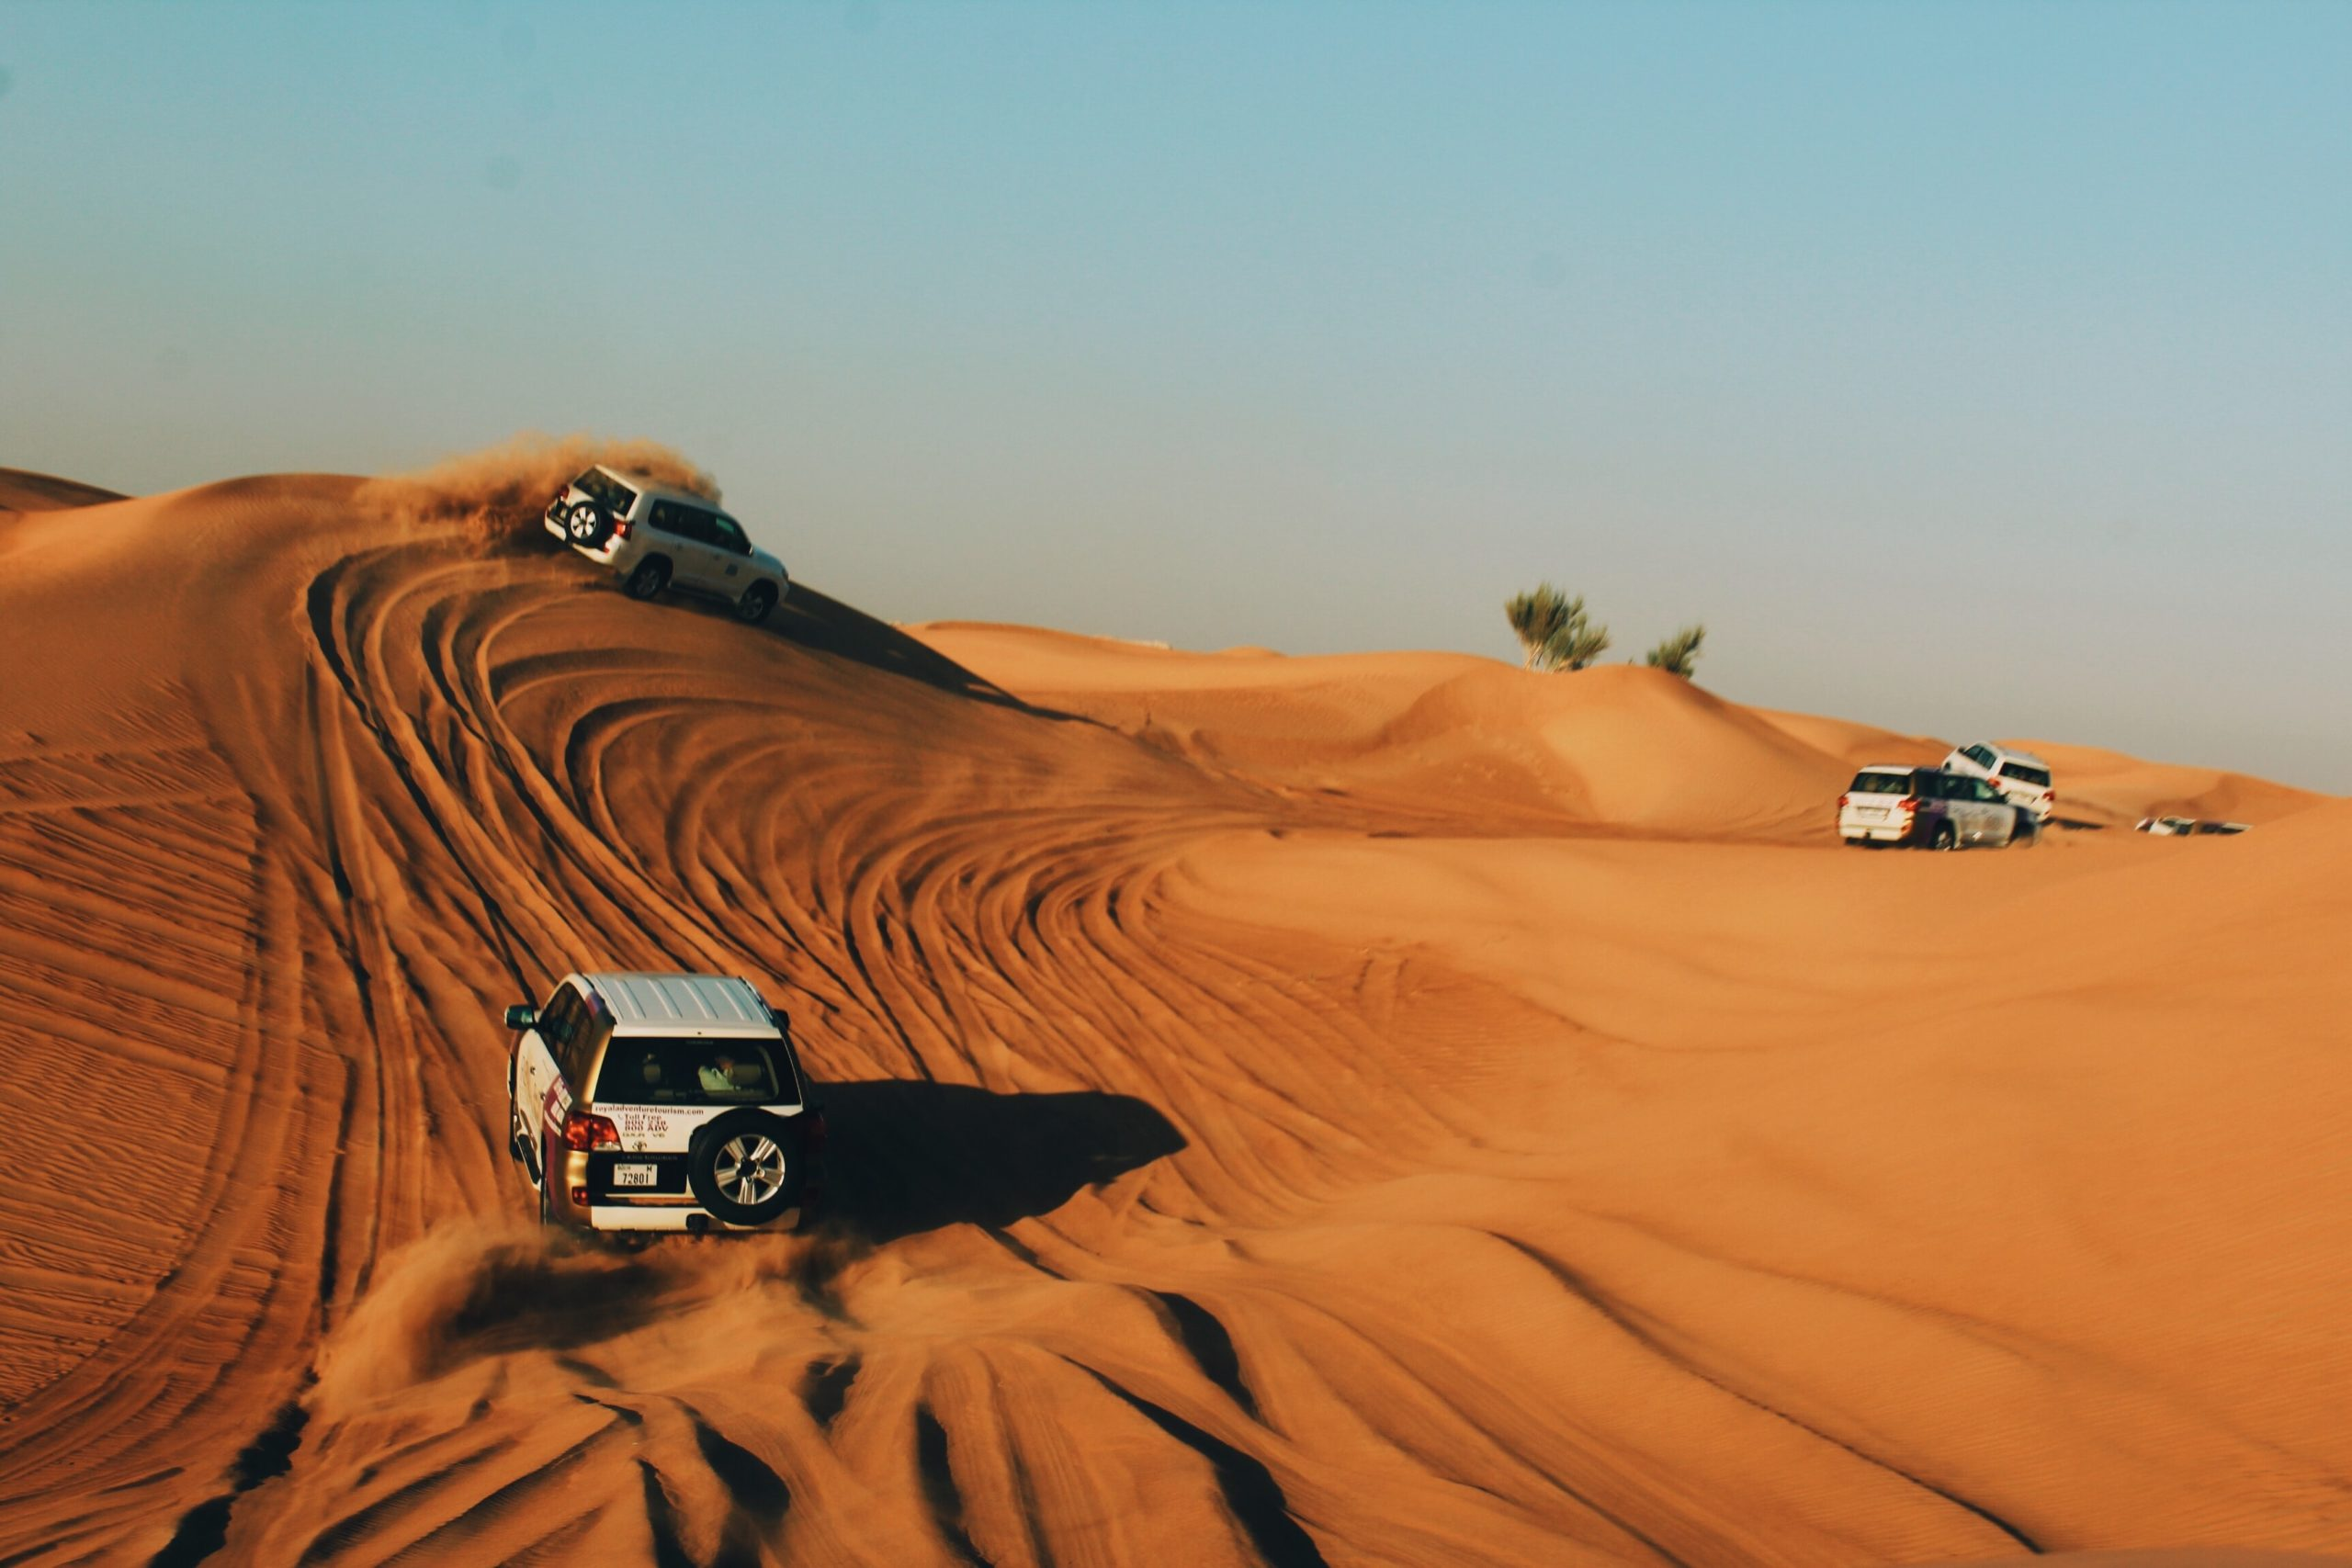 Tour di gruppo a Dubai a Gennaio 2022 per l'Expo